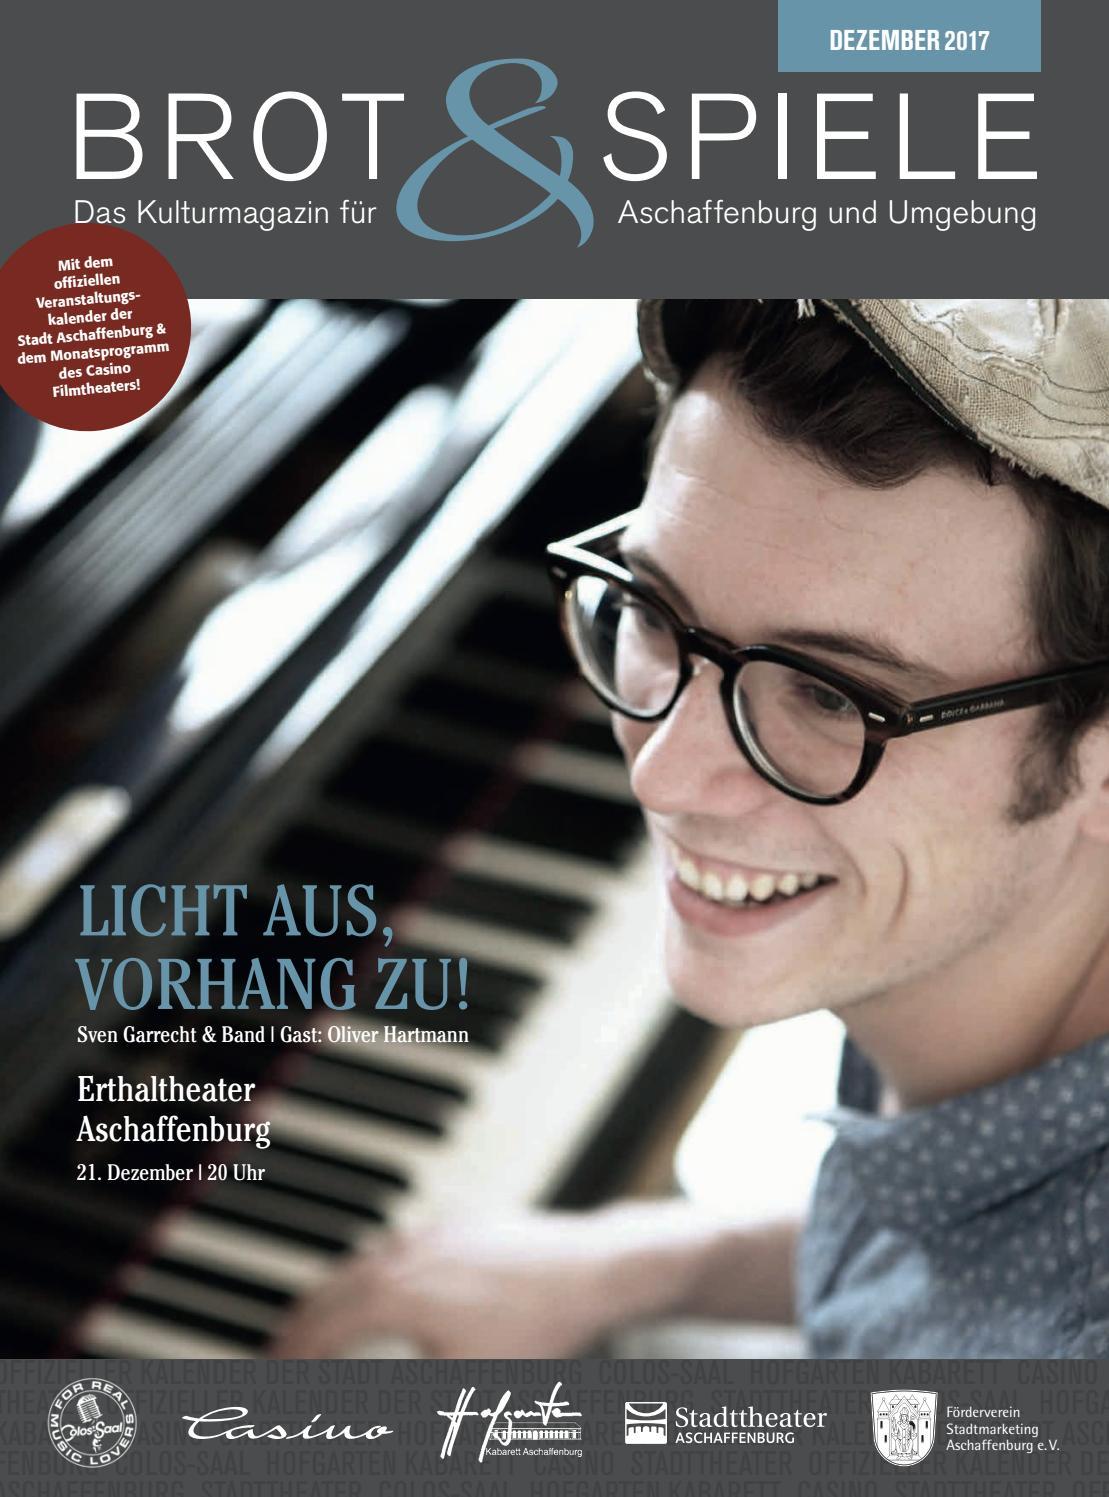 Brot & Spiele 12|2017 by MorgenWelt Verlag - issuu